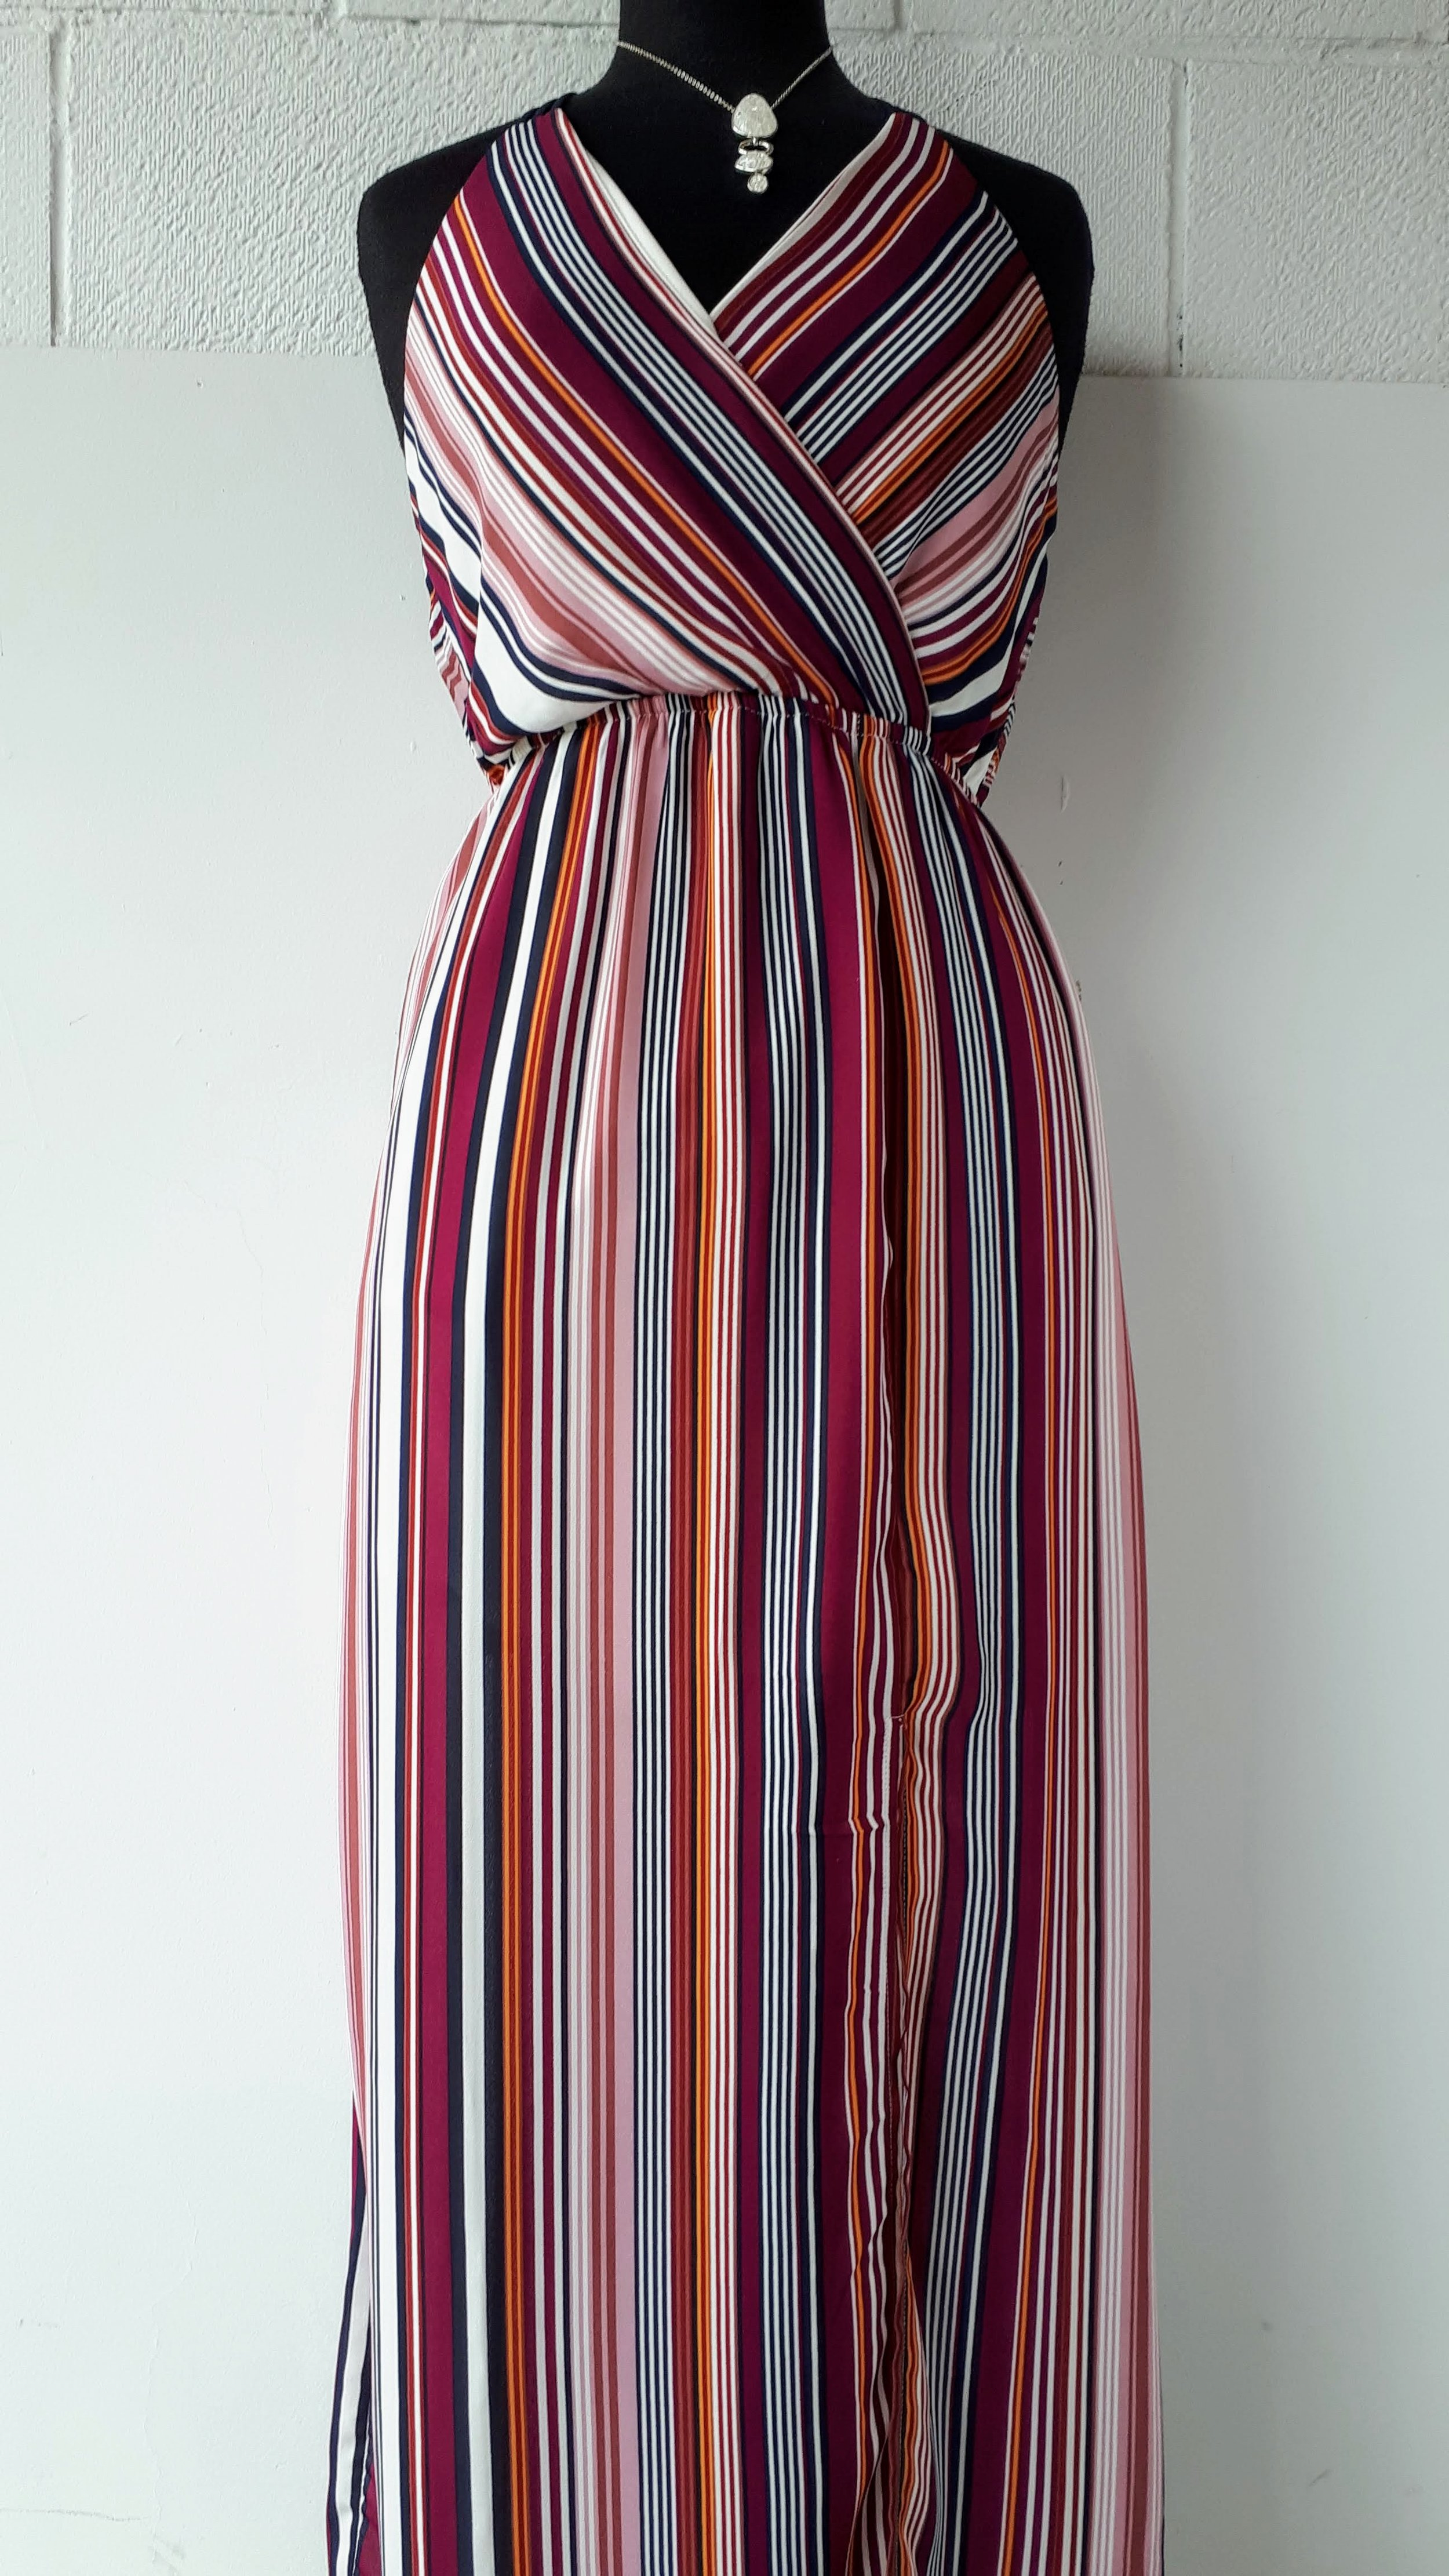 Moulinette Soeur dress; Size M, $34